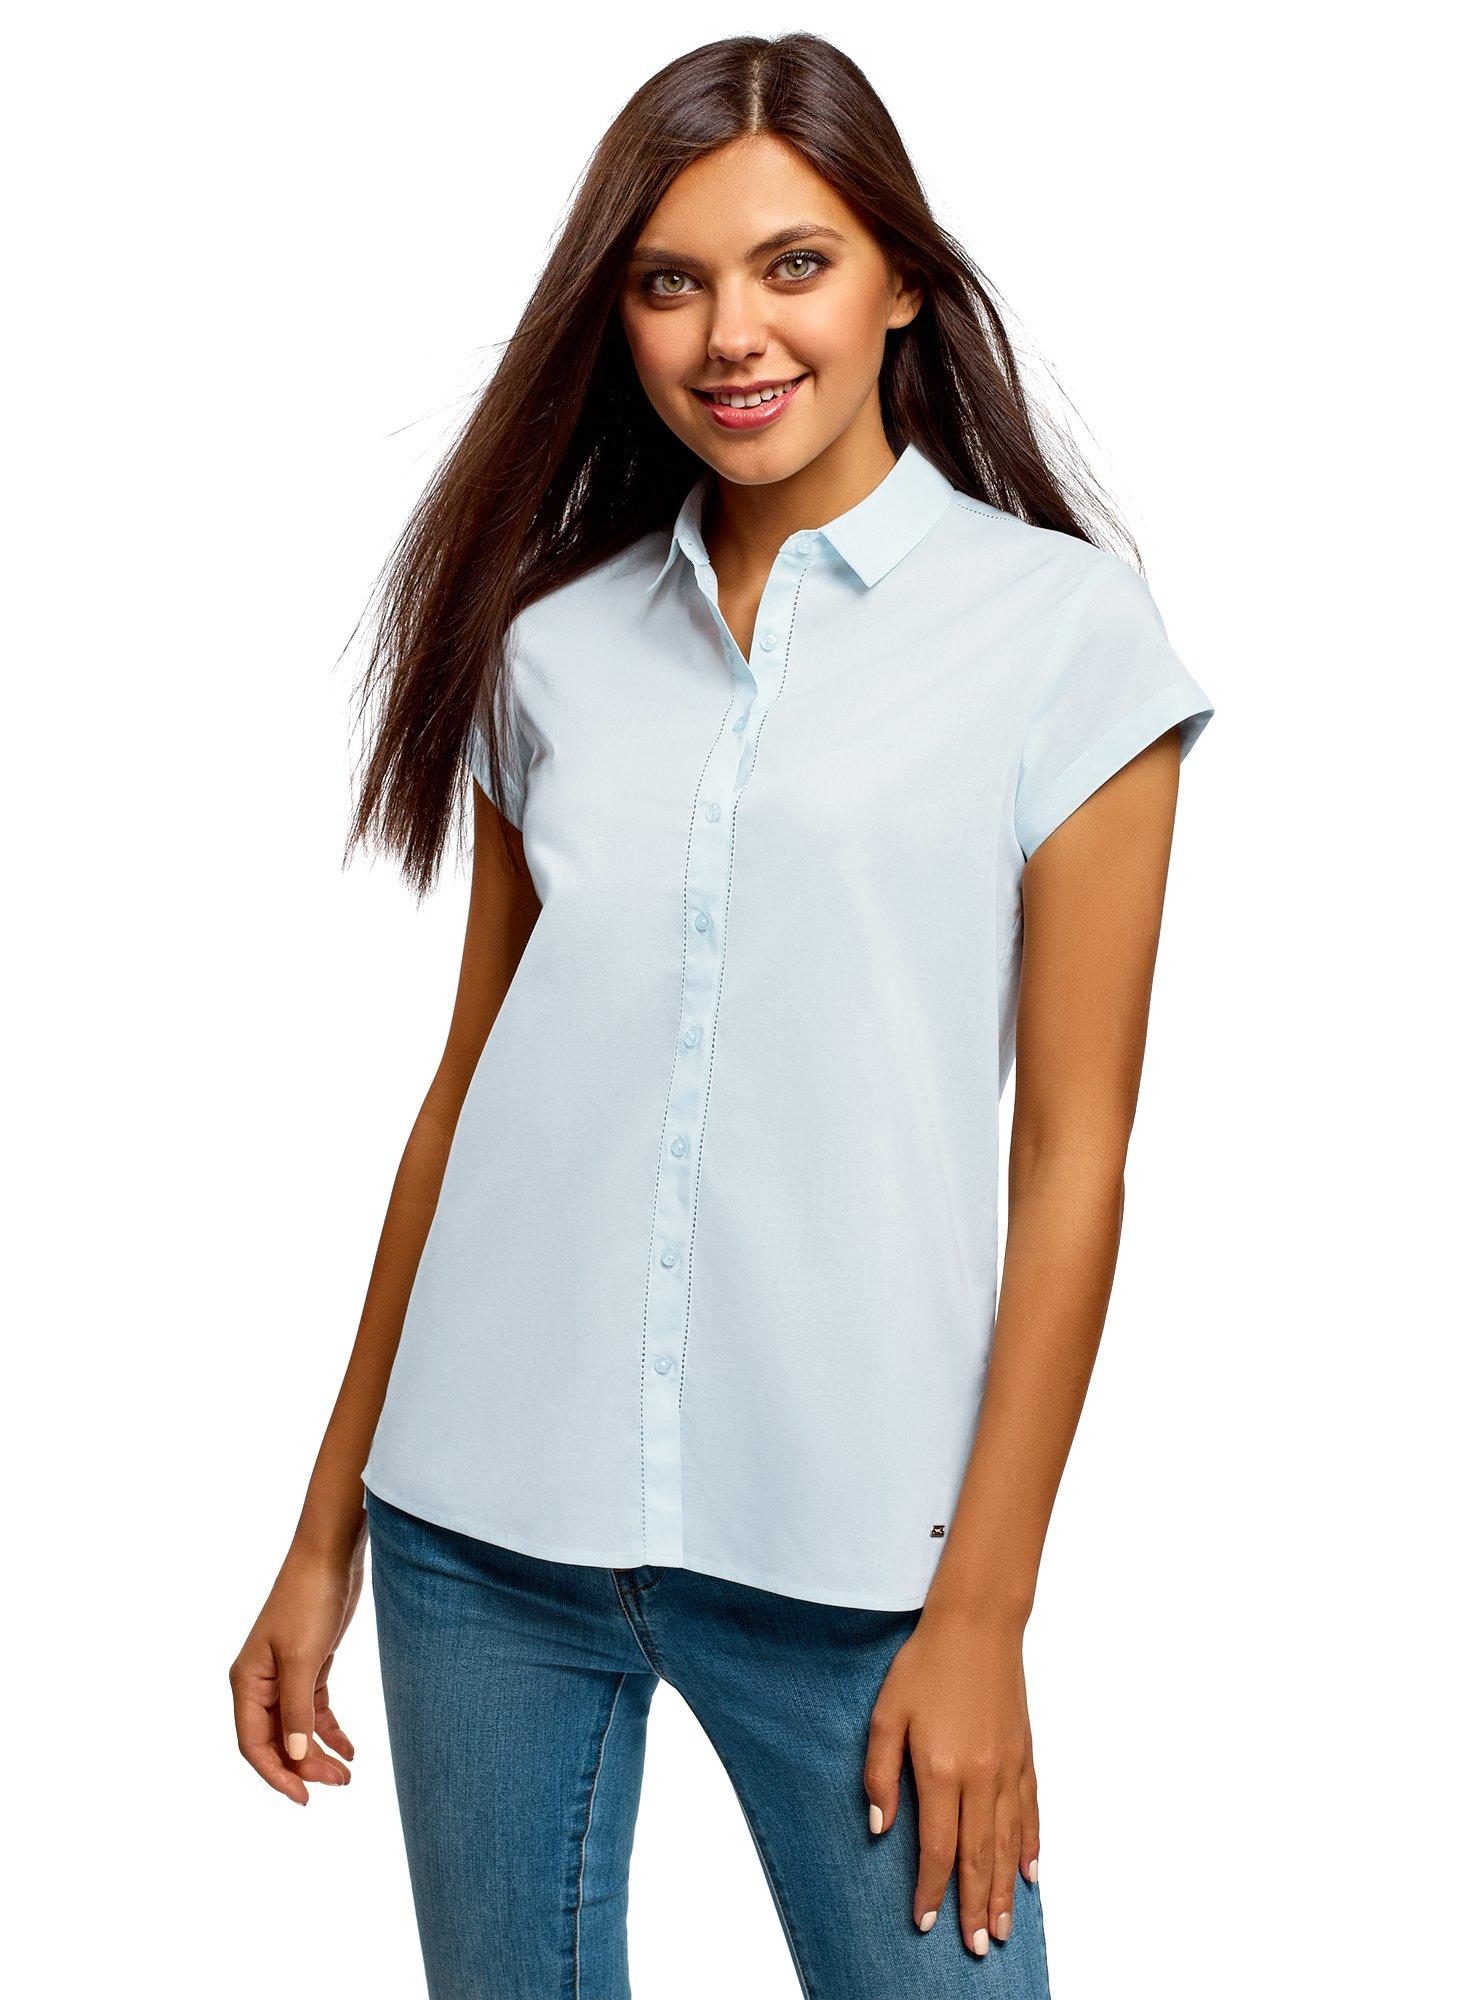 oodji Ultra Women's Short Sleeve Cotton Shirt with Turn-Ups, Blue, 2 by oodji (Image #1)